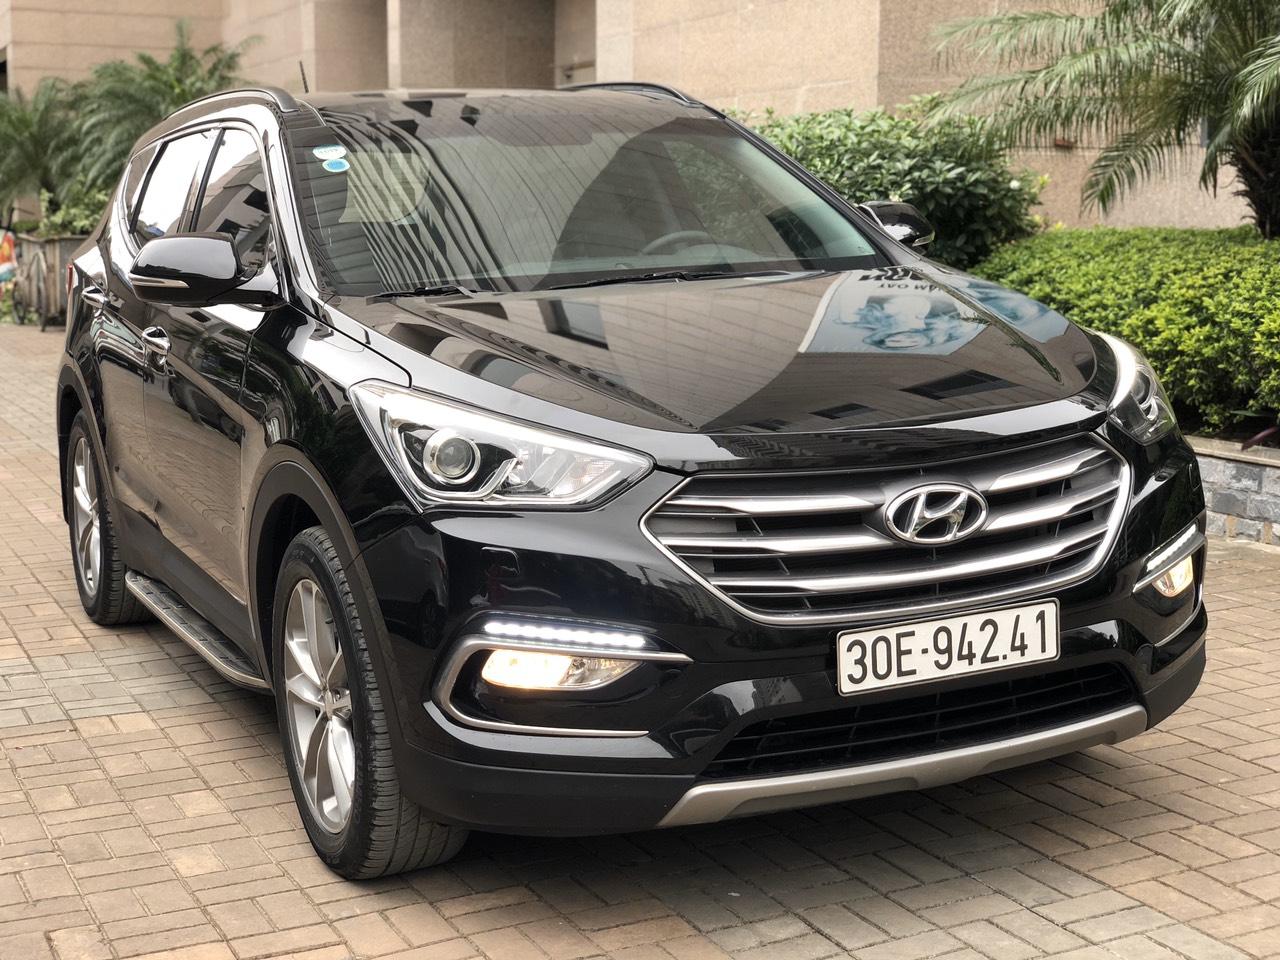 Hyundai Santafe 2017 full xăng